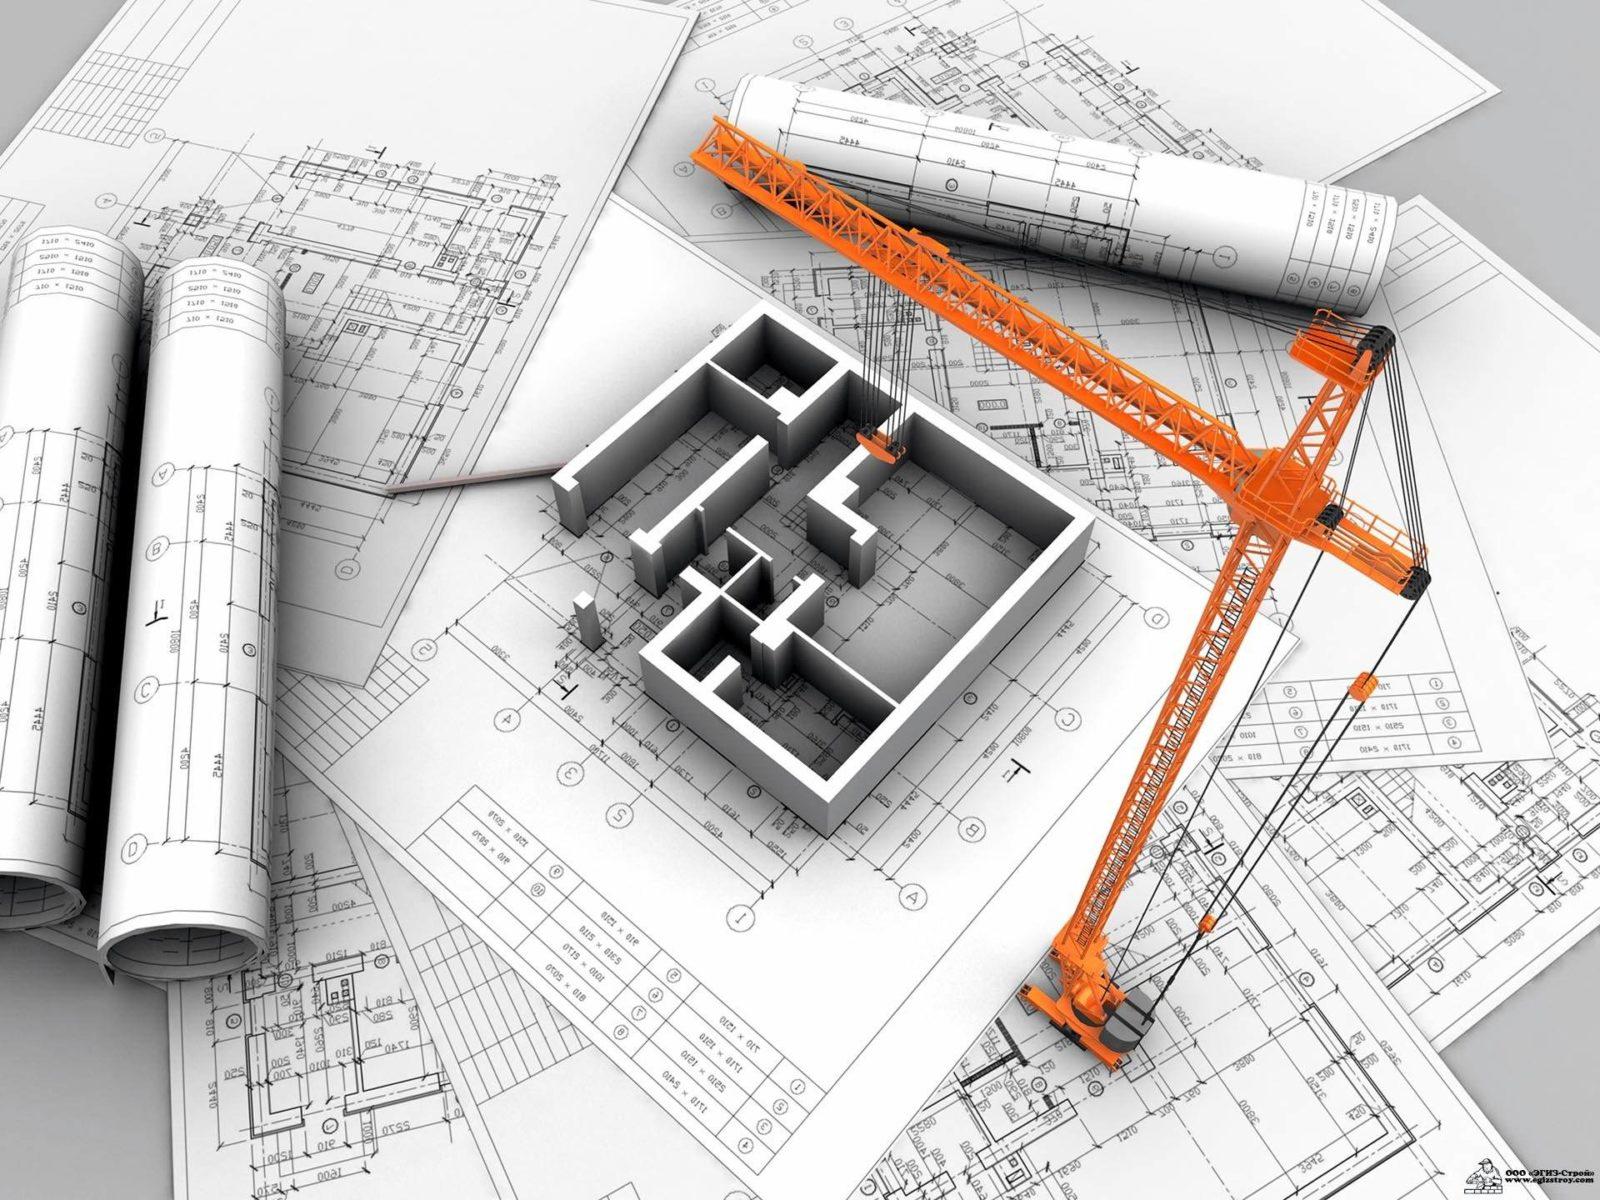 [:ua]Cкладання кошторисів будівництва[:ru]Составление смет строительства[:]